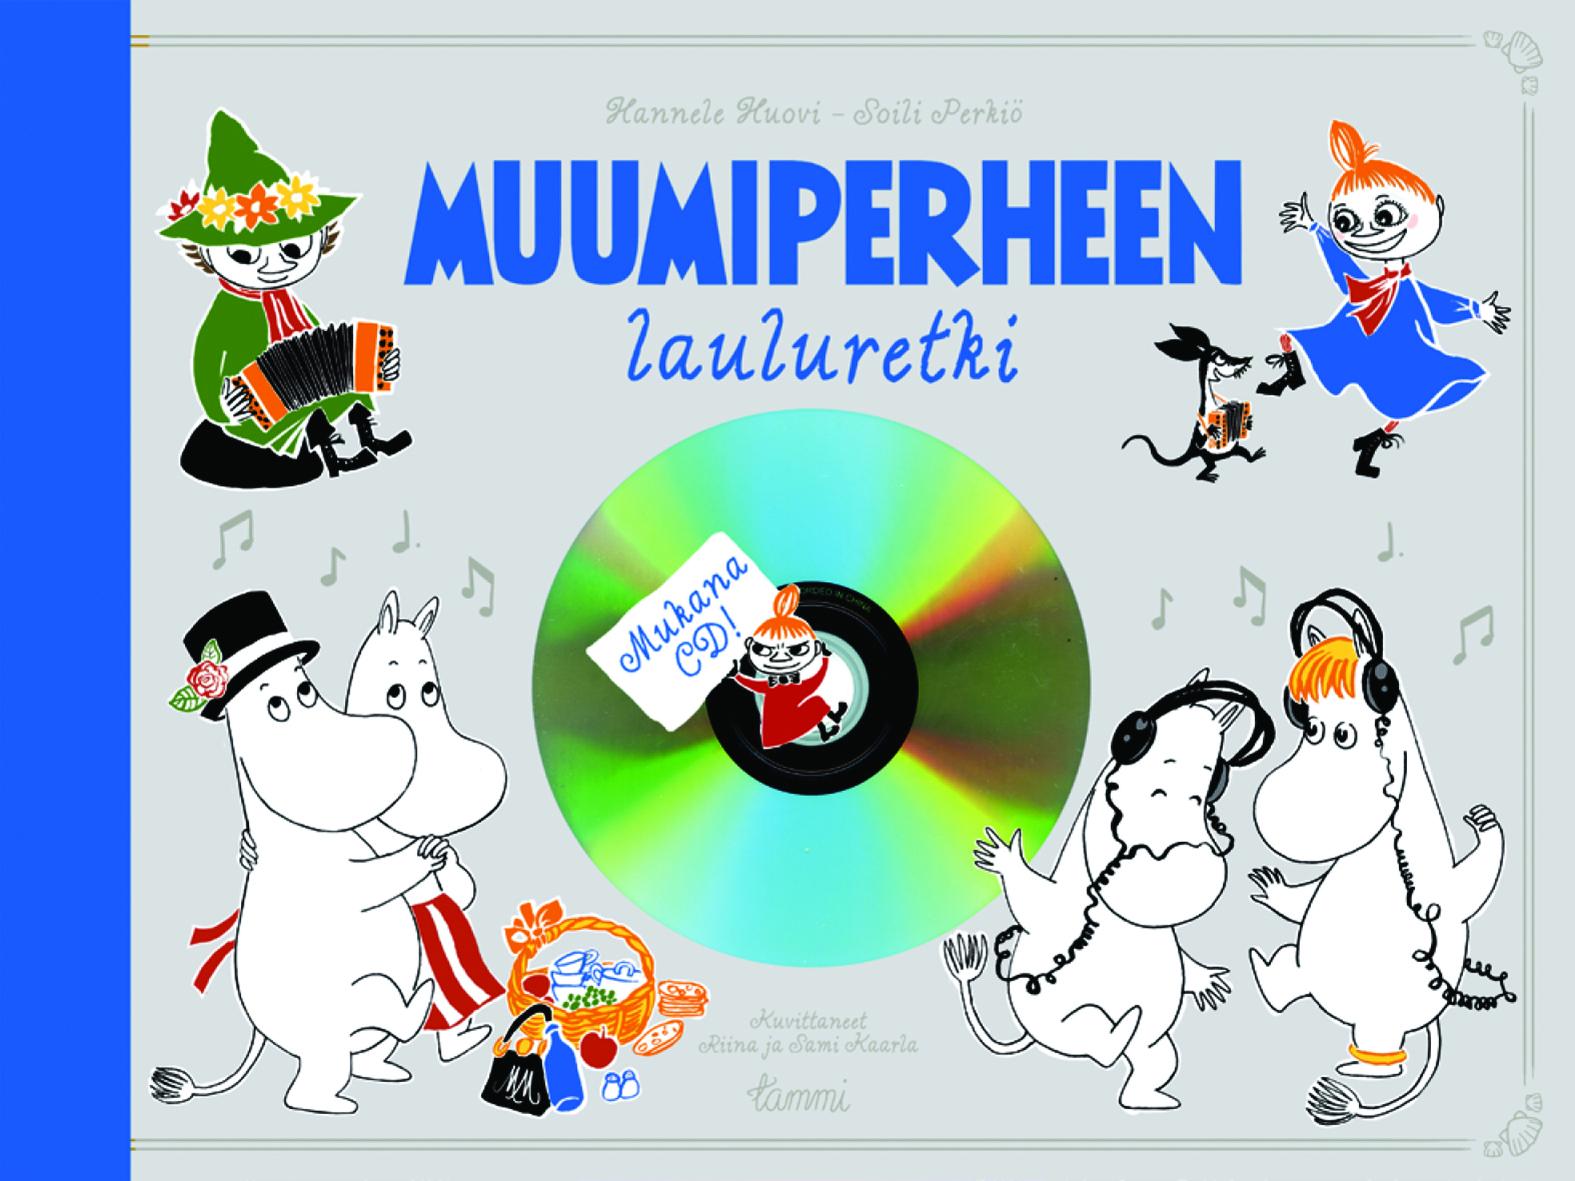 Tammi Muuminperheen lauluretki